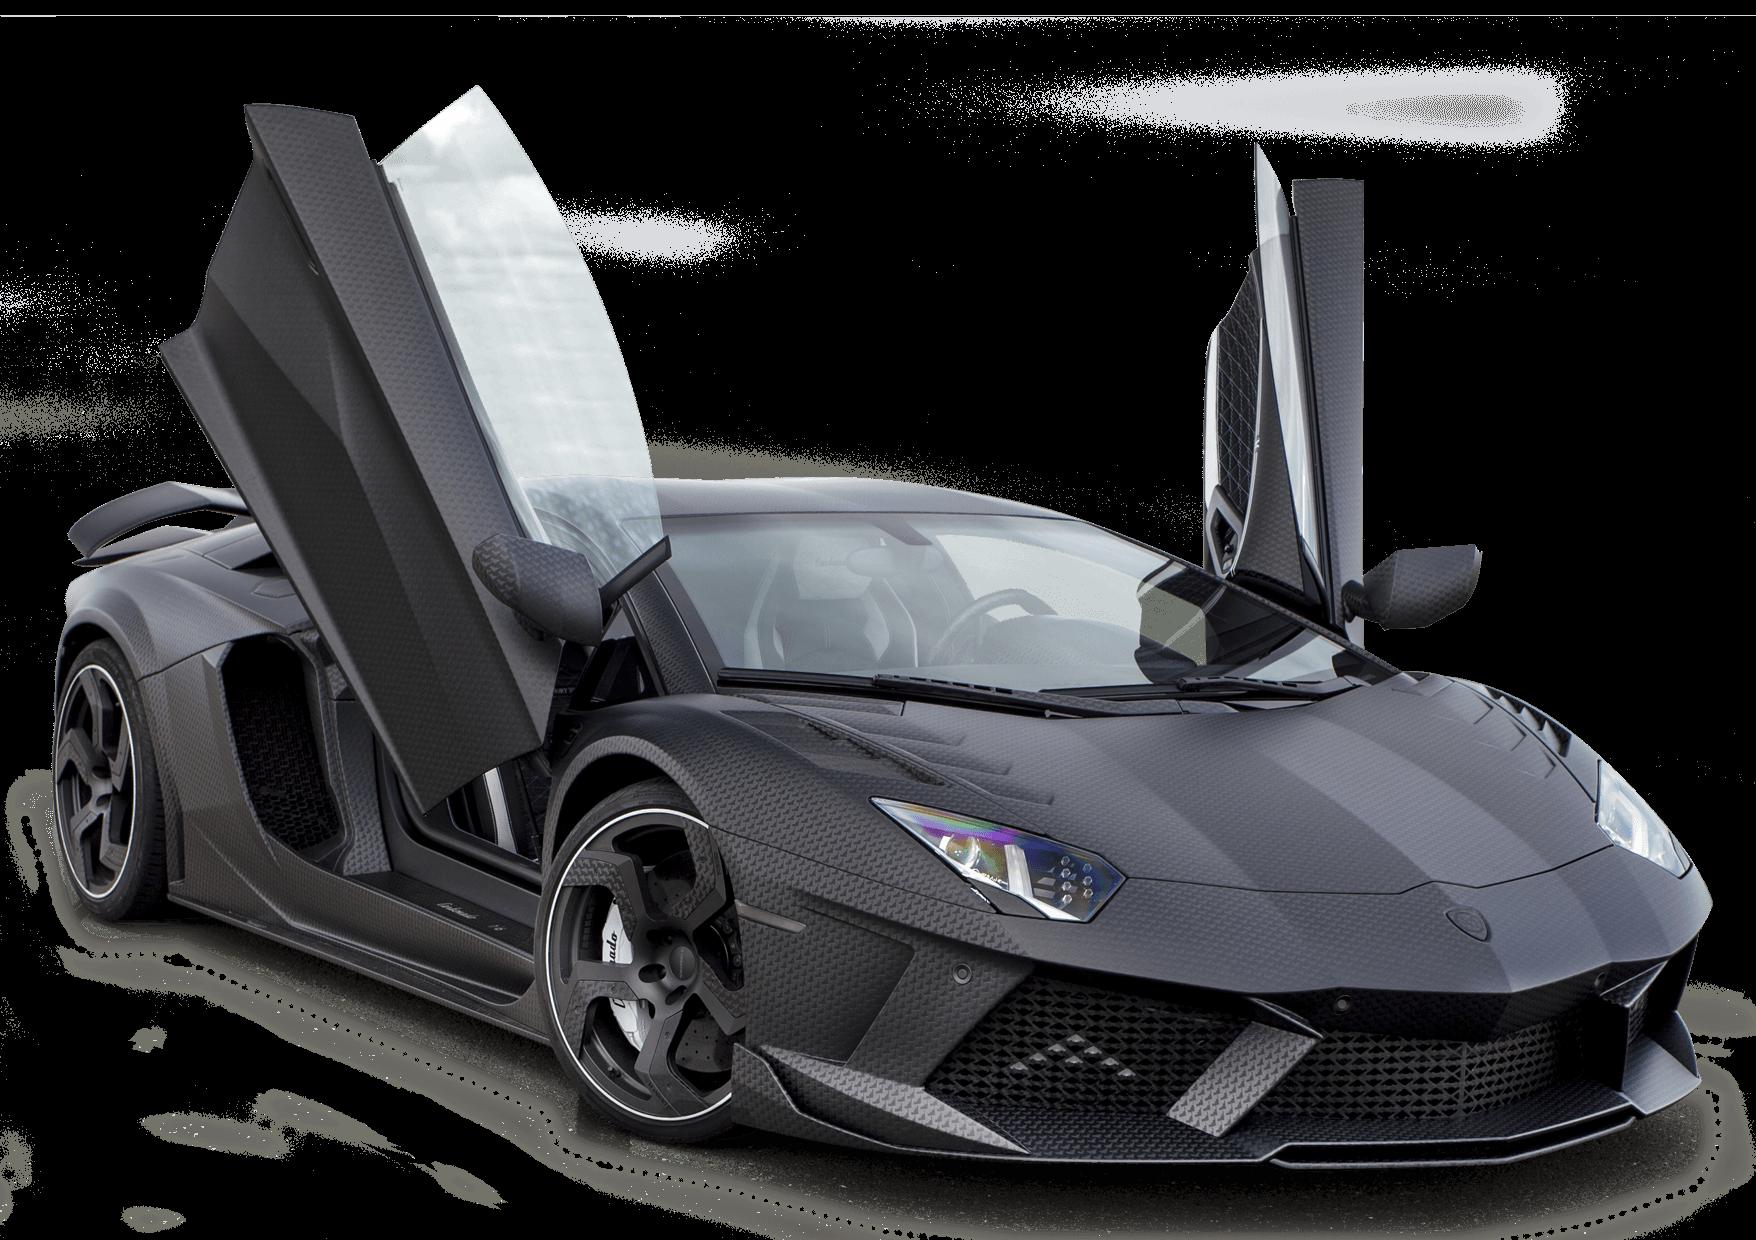 Lamborghini clipart lamborghini aventador Lamborghini StickPNG Aventador PNG Carbon